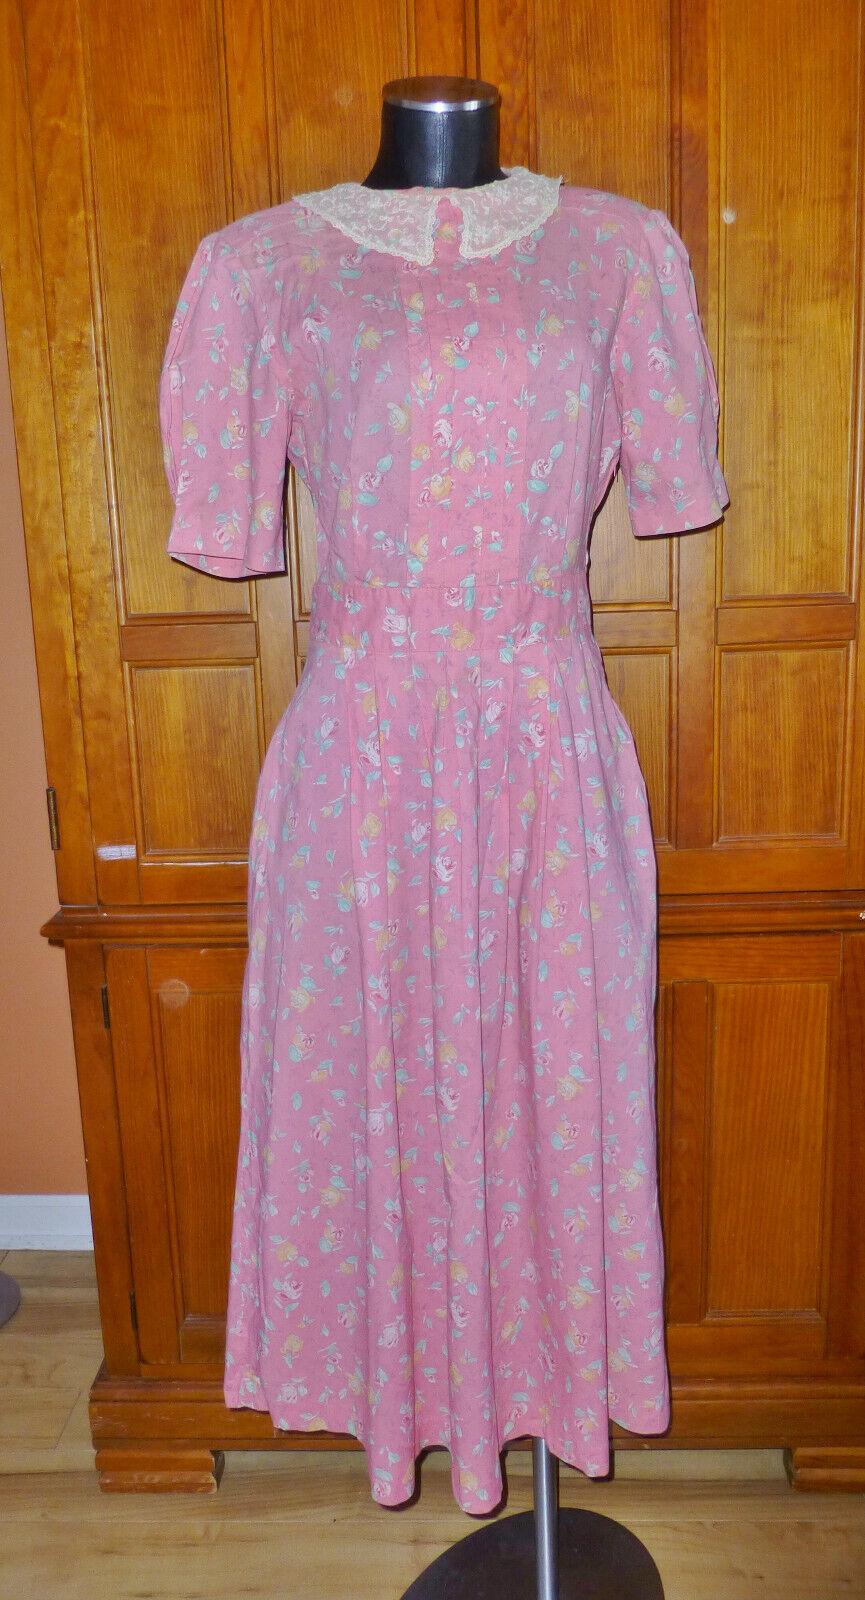 LAURA ASHLEY Vtg English Floral Cotton Lace Collar Garden Party midi DRESS